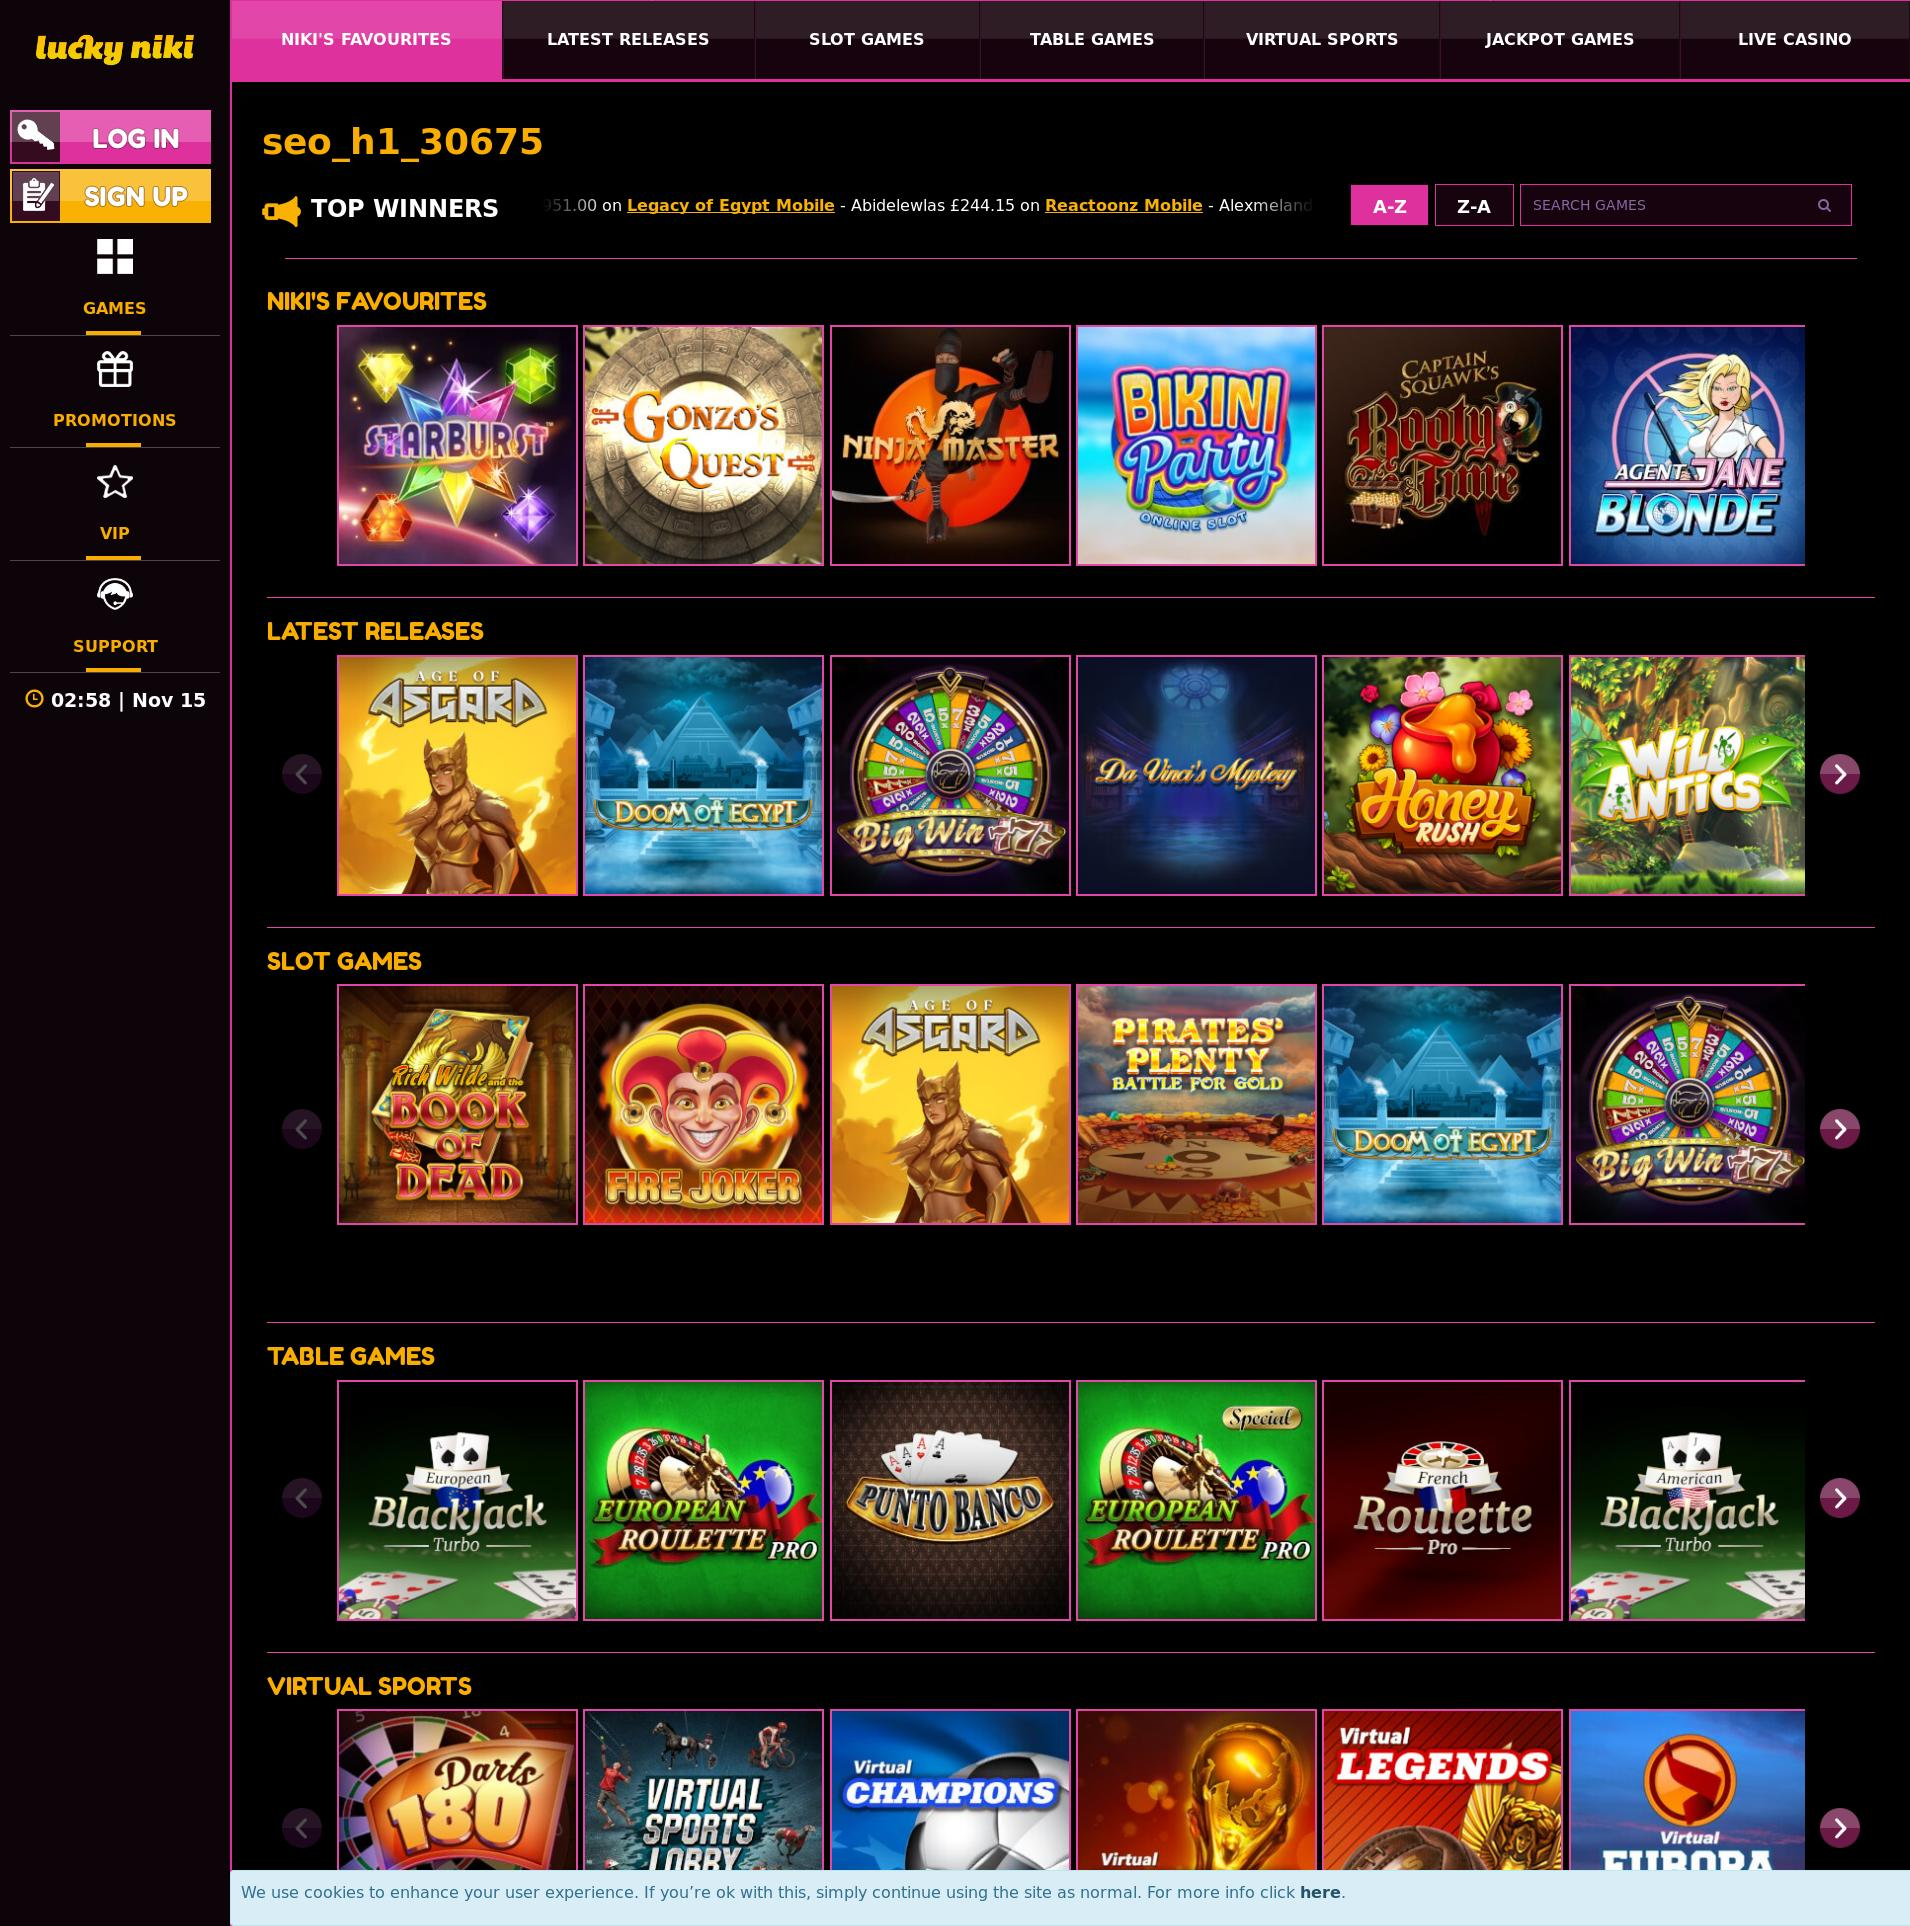 Casino screen Lobby 2019-11-15 for United Kingdom